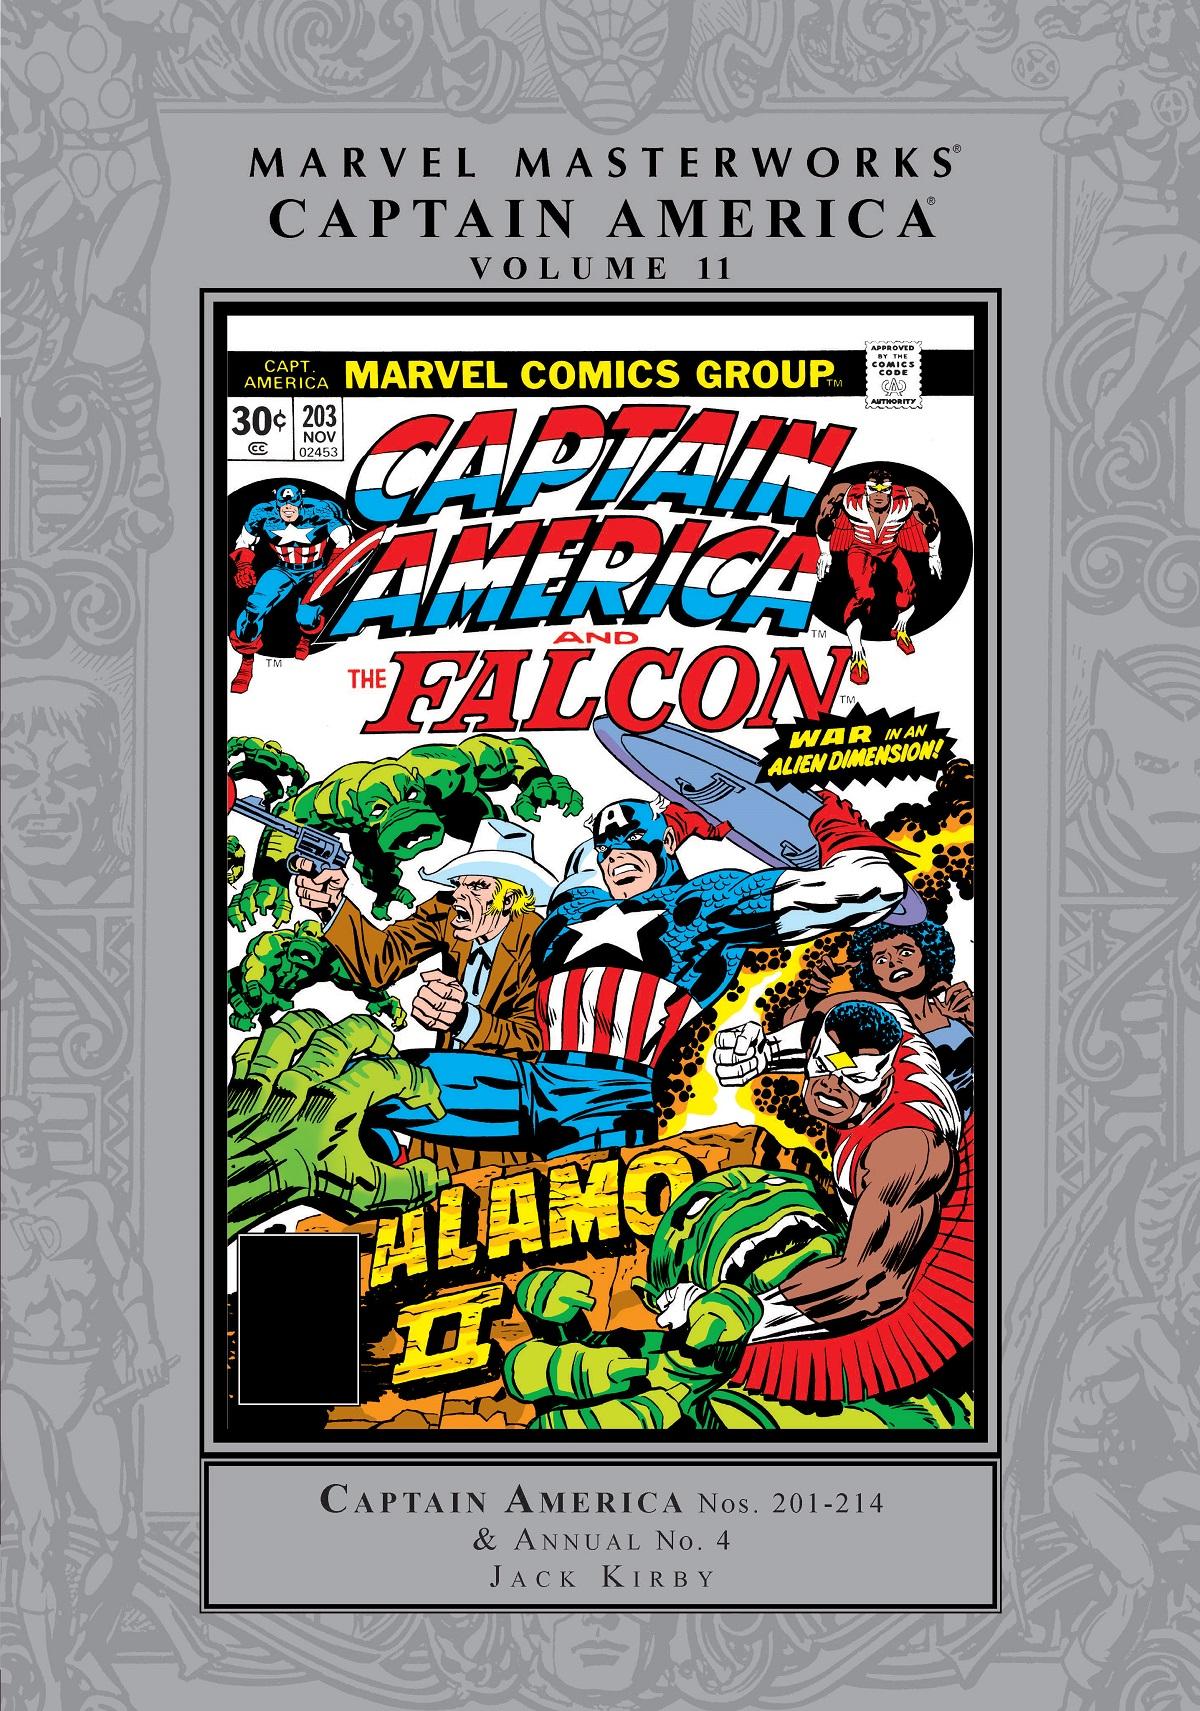 Marvel Masterworks: Captain America Vol. 11 (Hardcover)